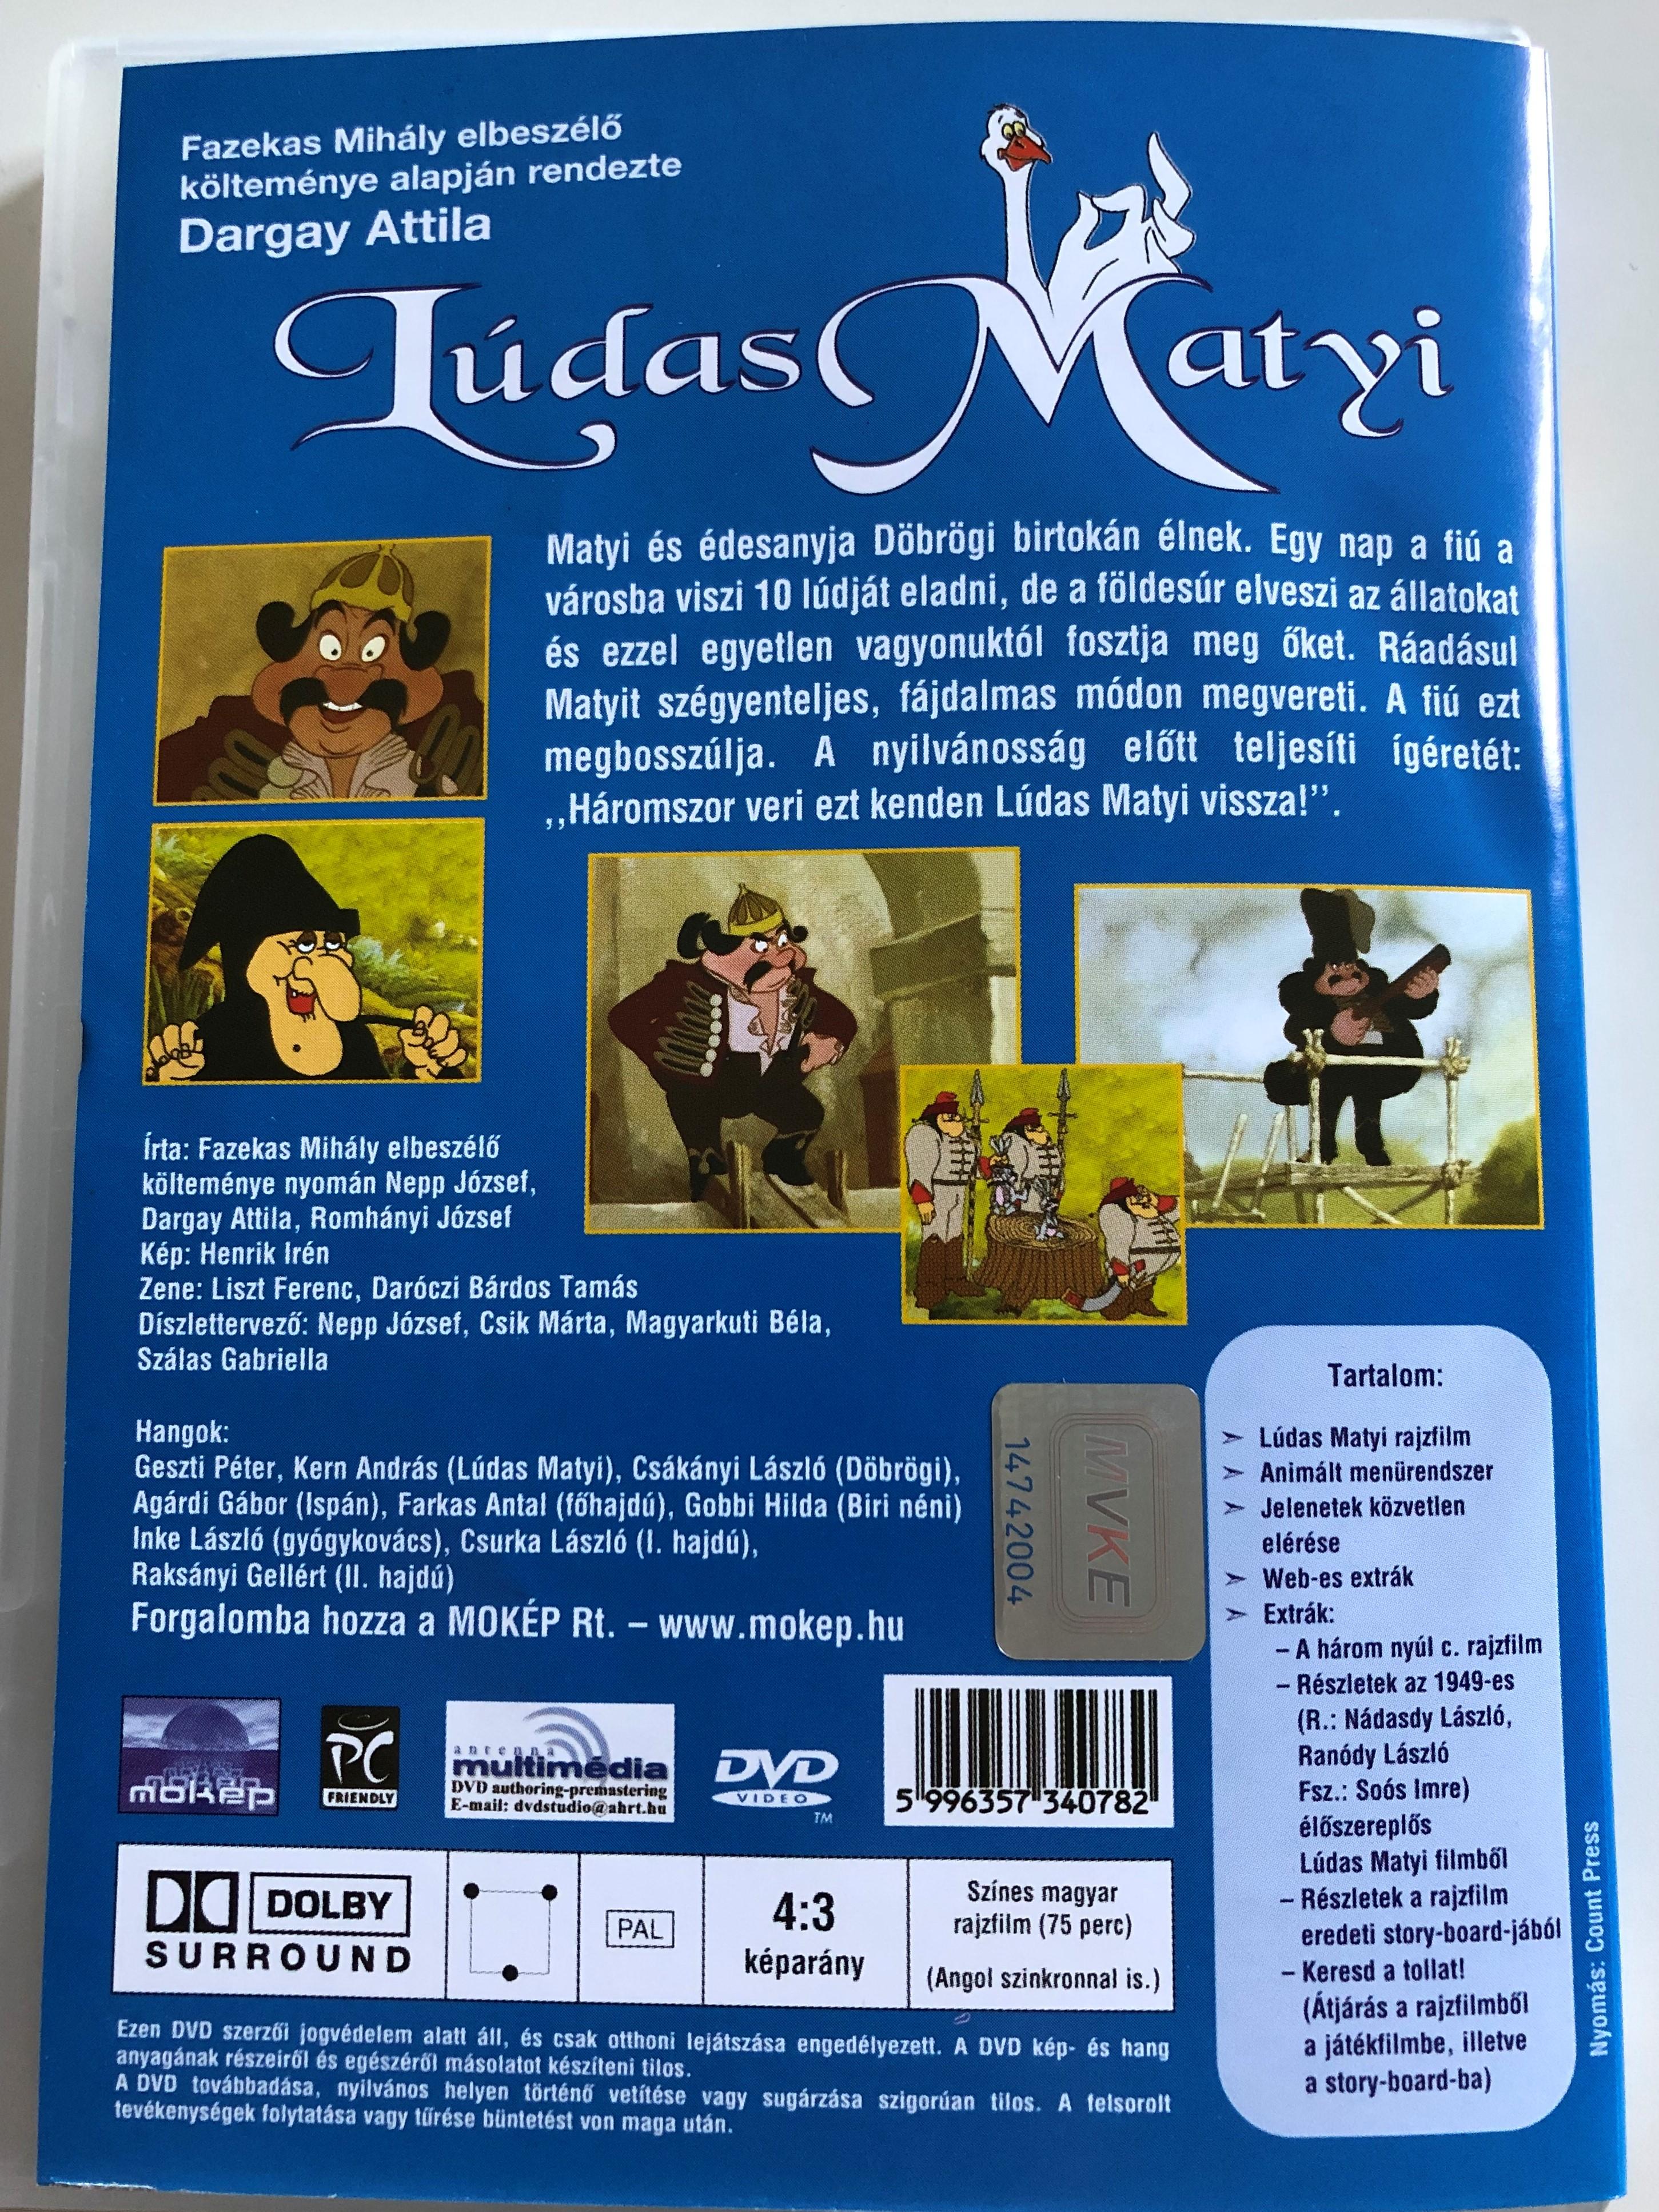 mattie-the-gooseboy-dvd-1977-l-das-matyi-directed-by-dargay-attila-hungarian-cartoon-magyar-mesefilm-written-by-fazekas-mih-ly-2-.jpg